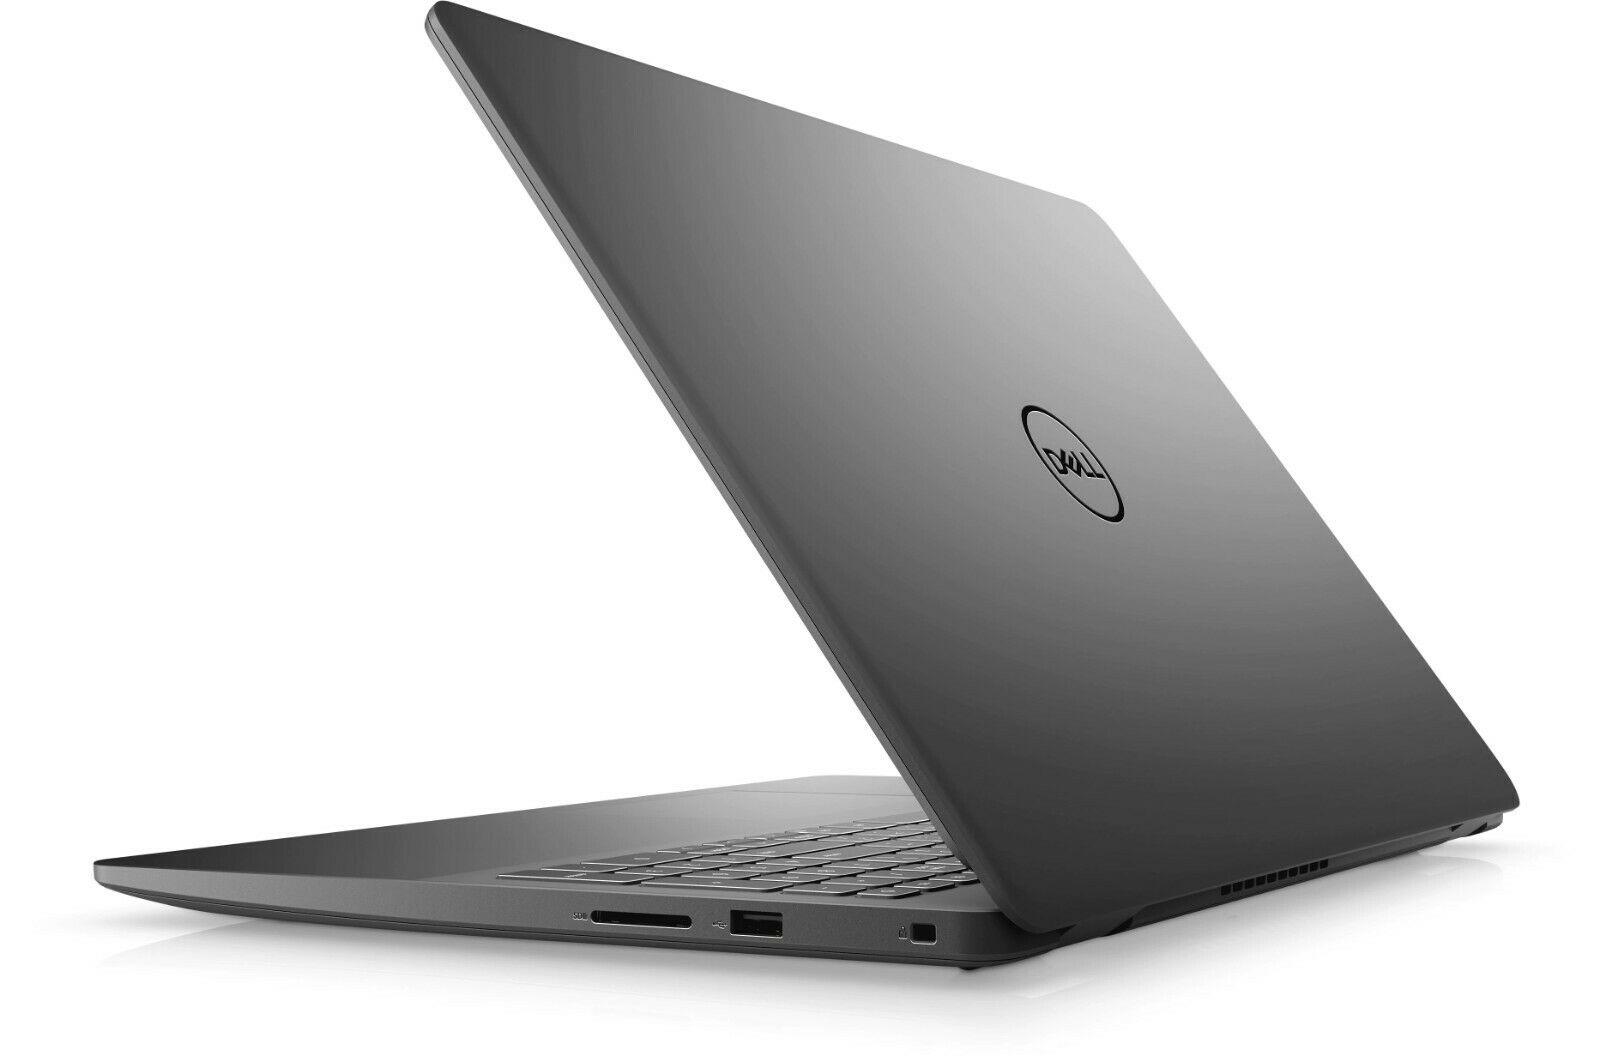 Ноутбук DELL Inspiron 15 3502 (INSP-15- 3000/128G/4G) 2